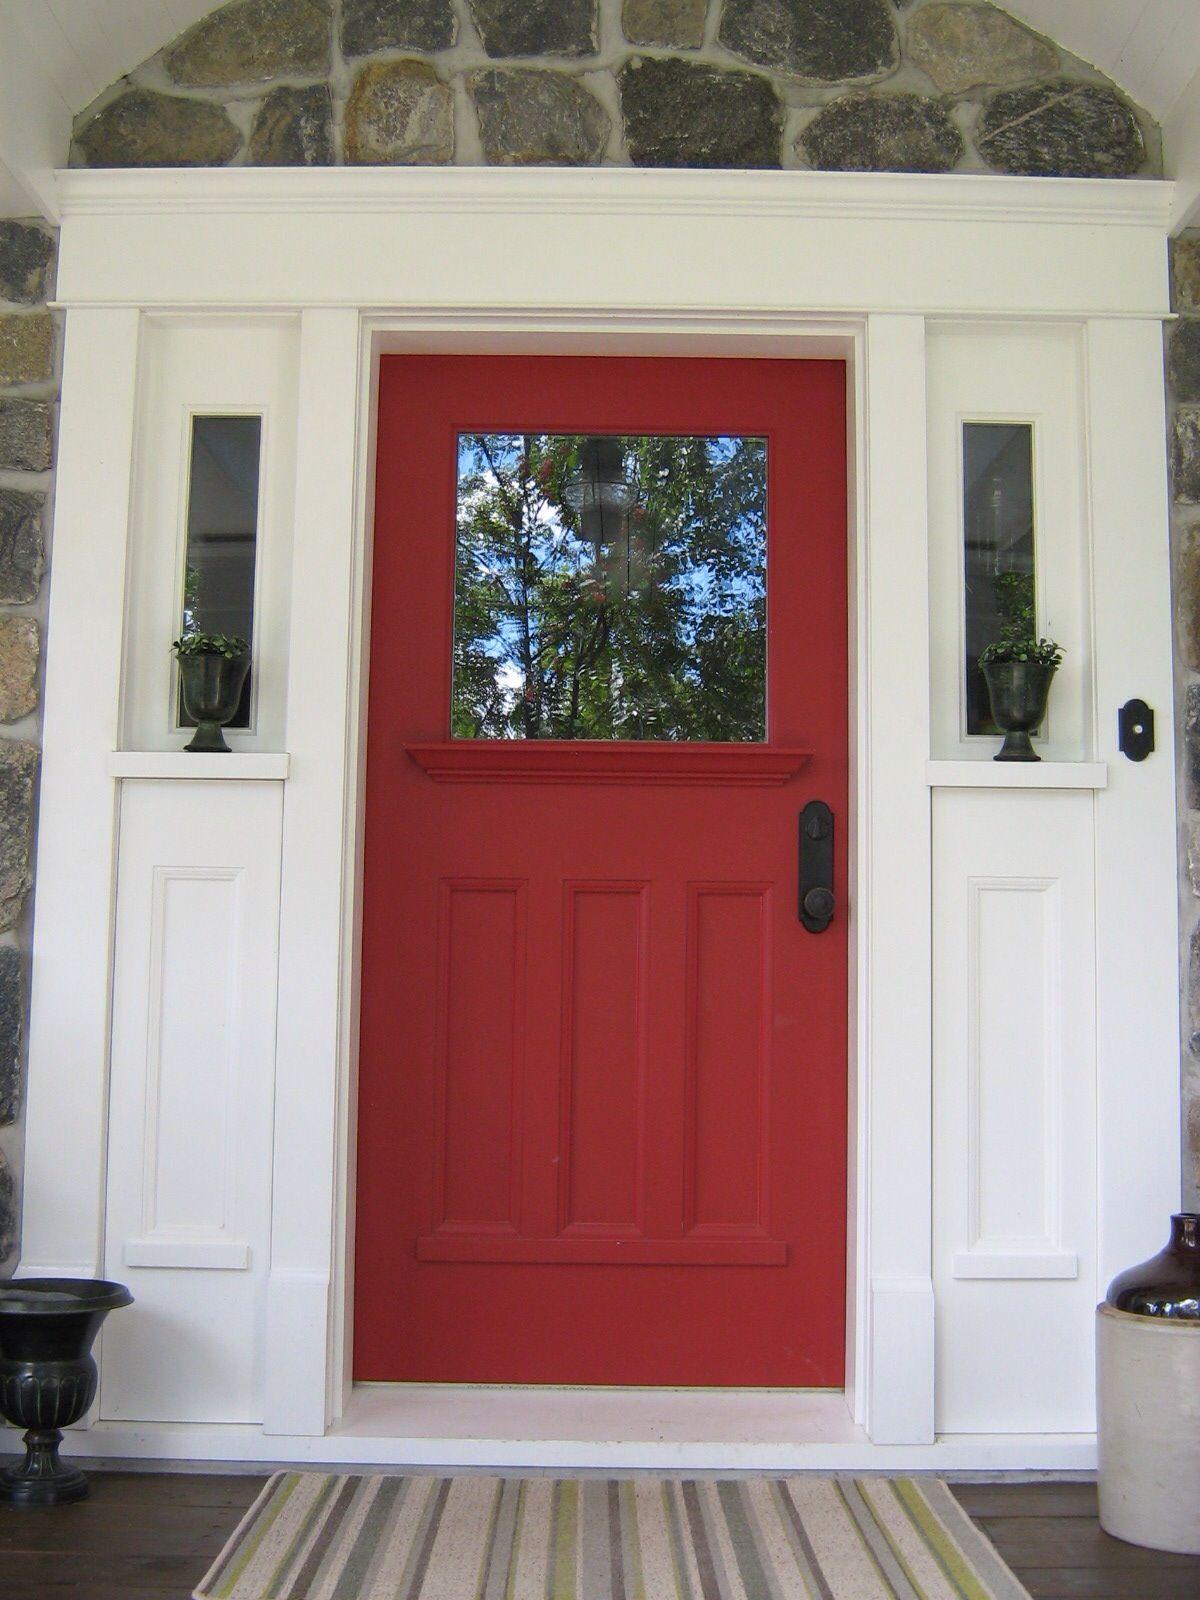 Porte d 39 entr e en bois menuiserie delisle entr e for Menuiserie porte fenetre bois